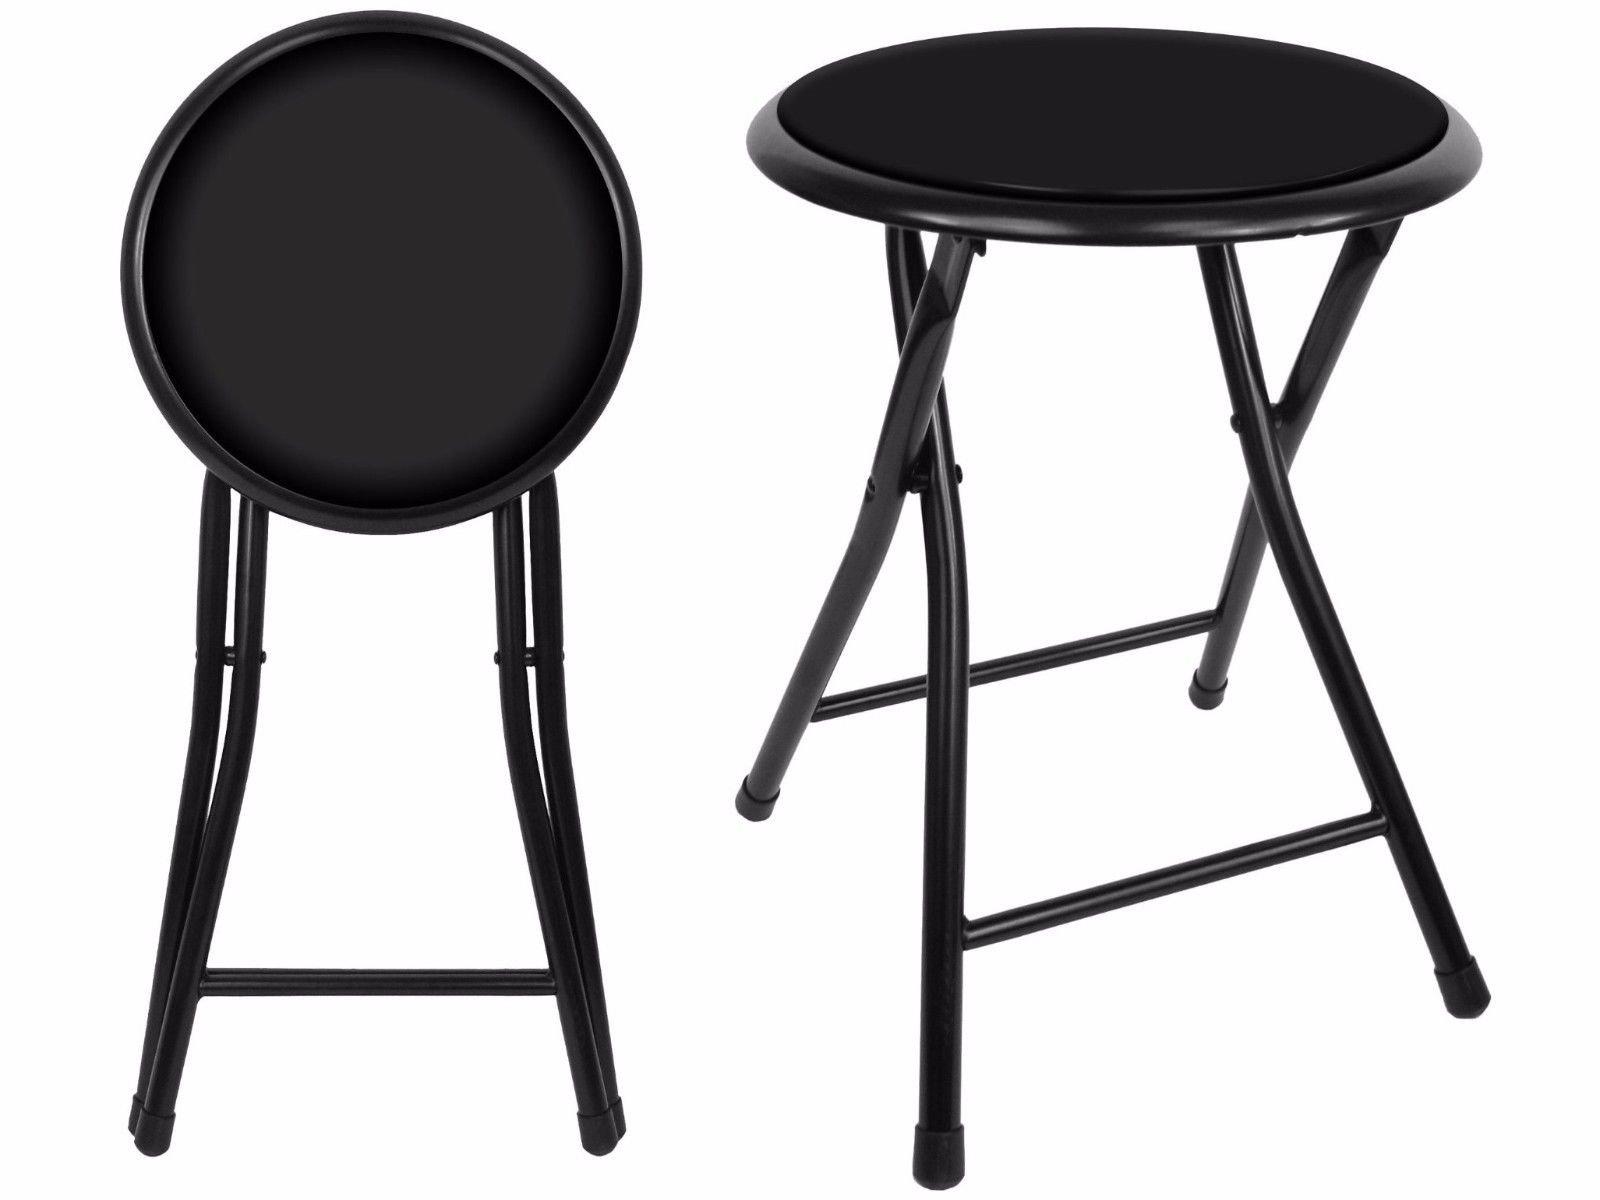 18'' Premium Lightweight Black Folding Cushioned Stool Outdoor Indoor Barstool Chair (Single Pack)